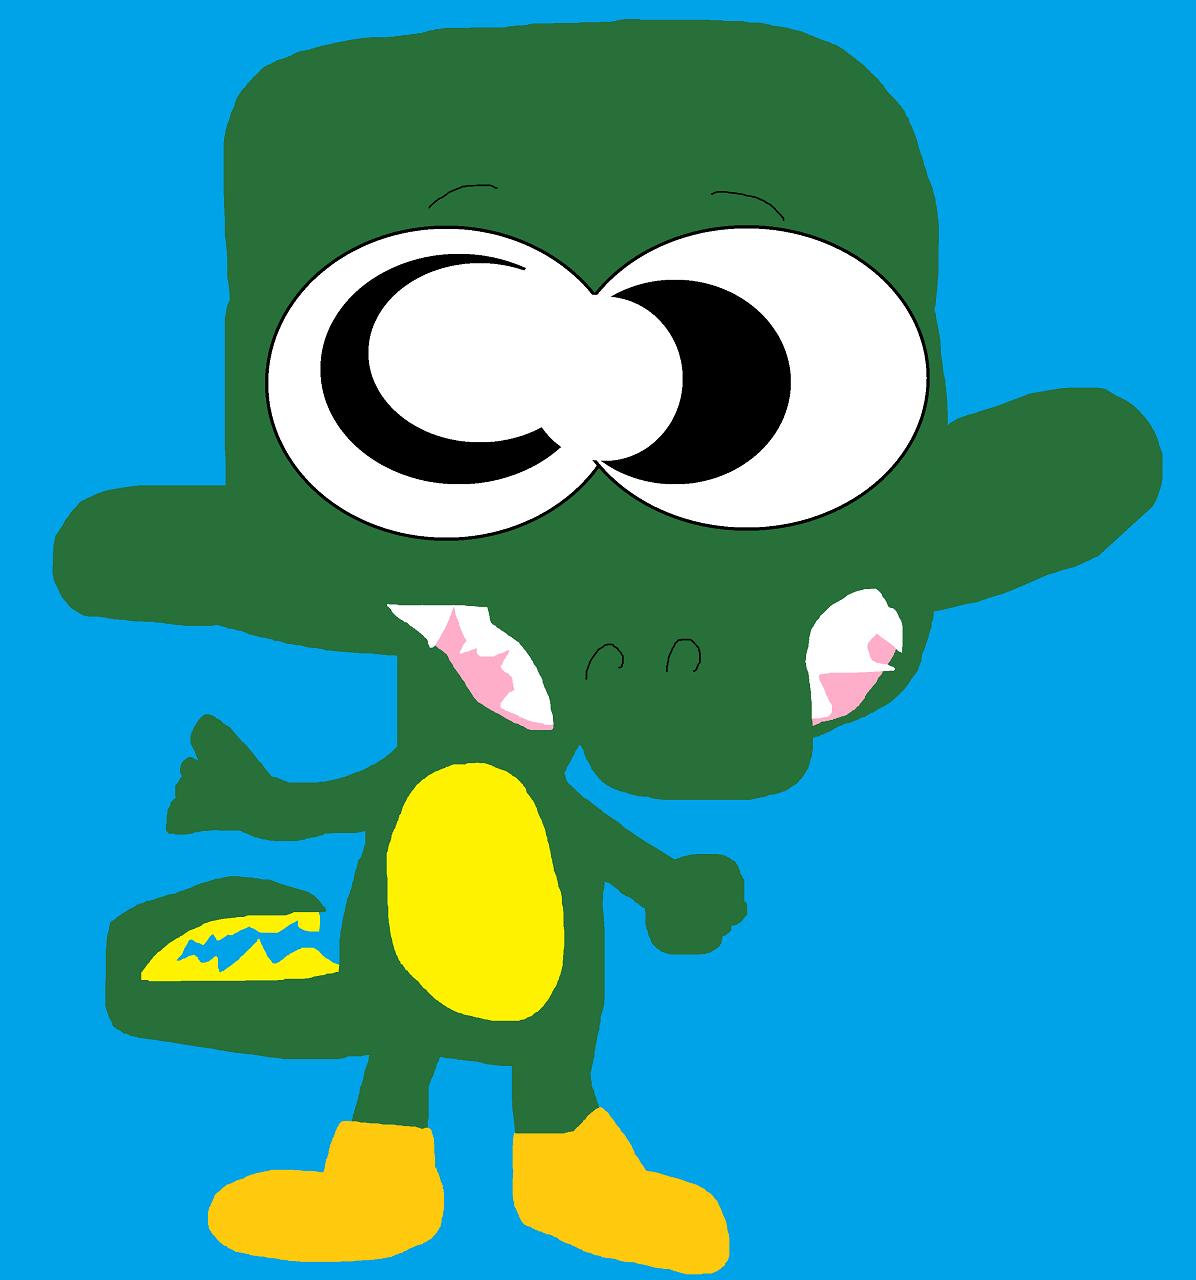 Just Another Cute Random Gatortales Green Gator by Falconlobo